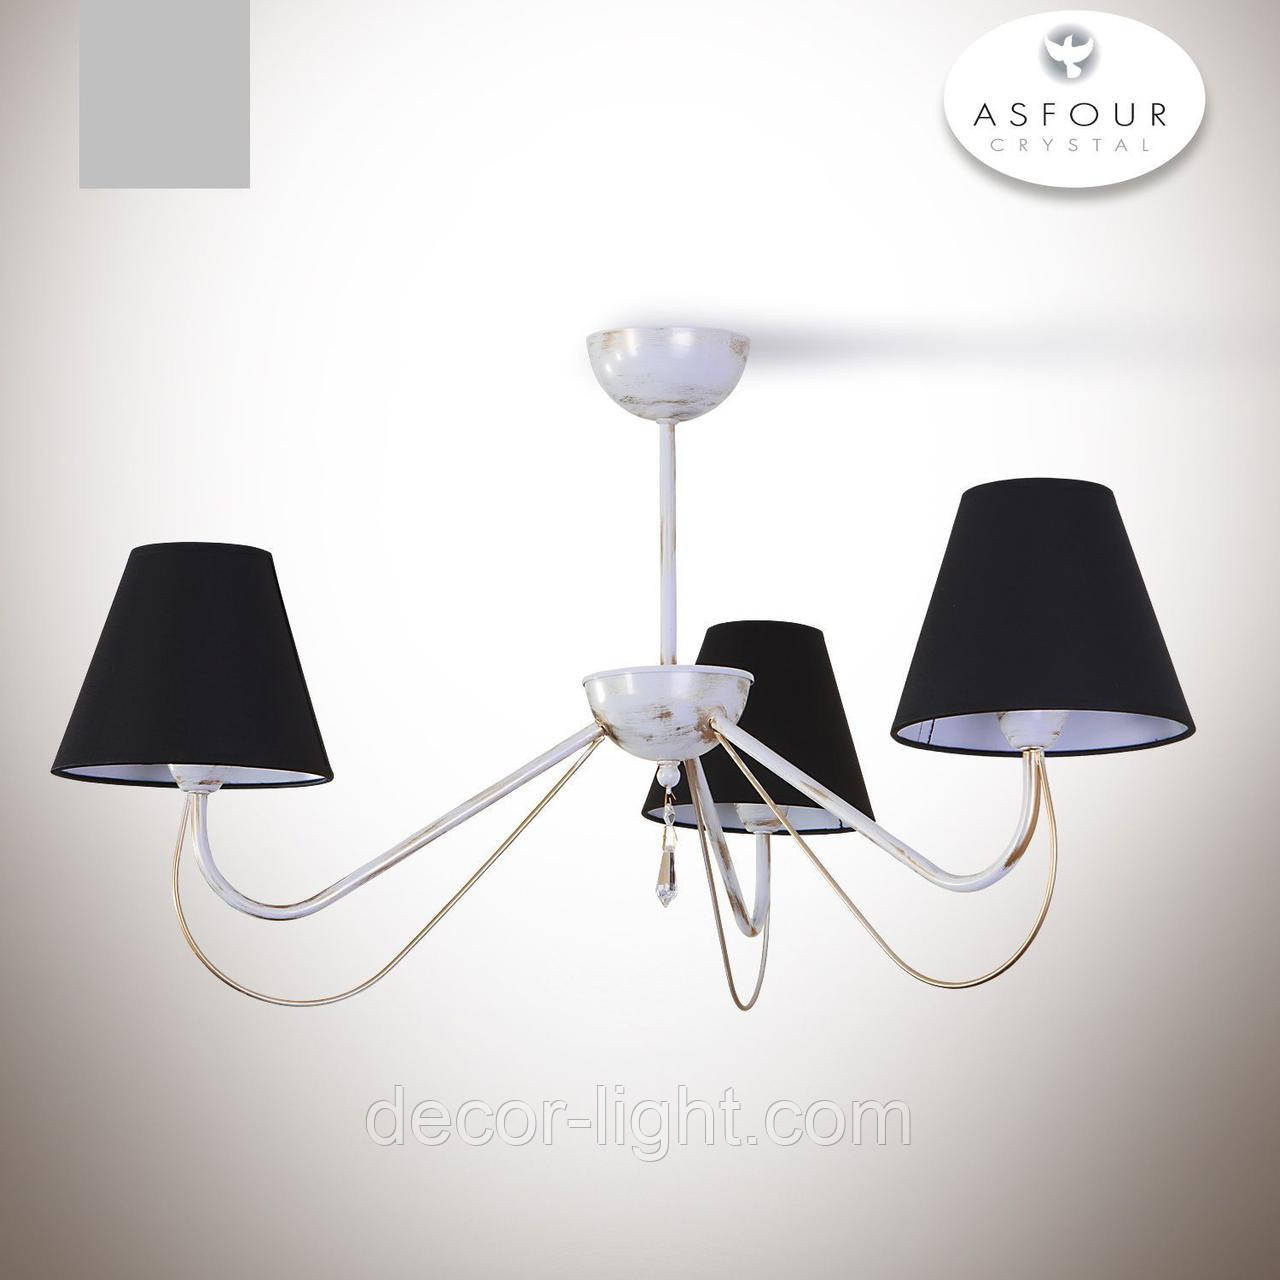 Люстра для небольшой комнаты, для спальни 3-х ламповая 20403-2